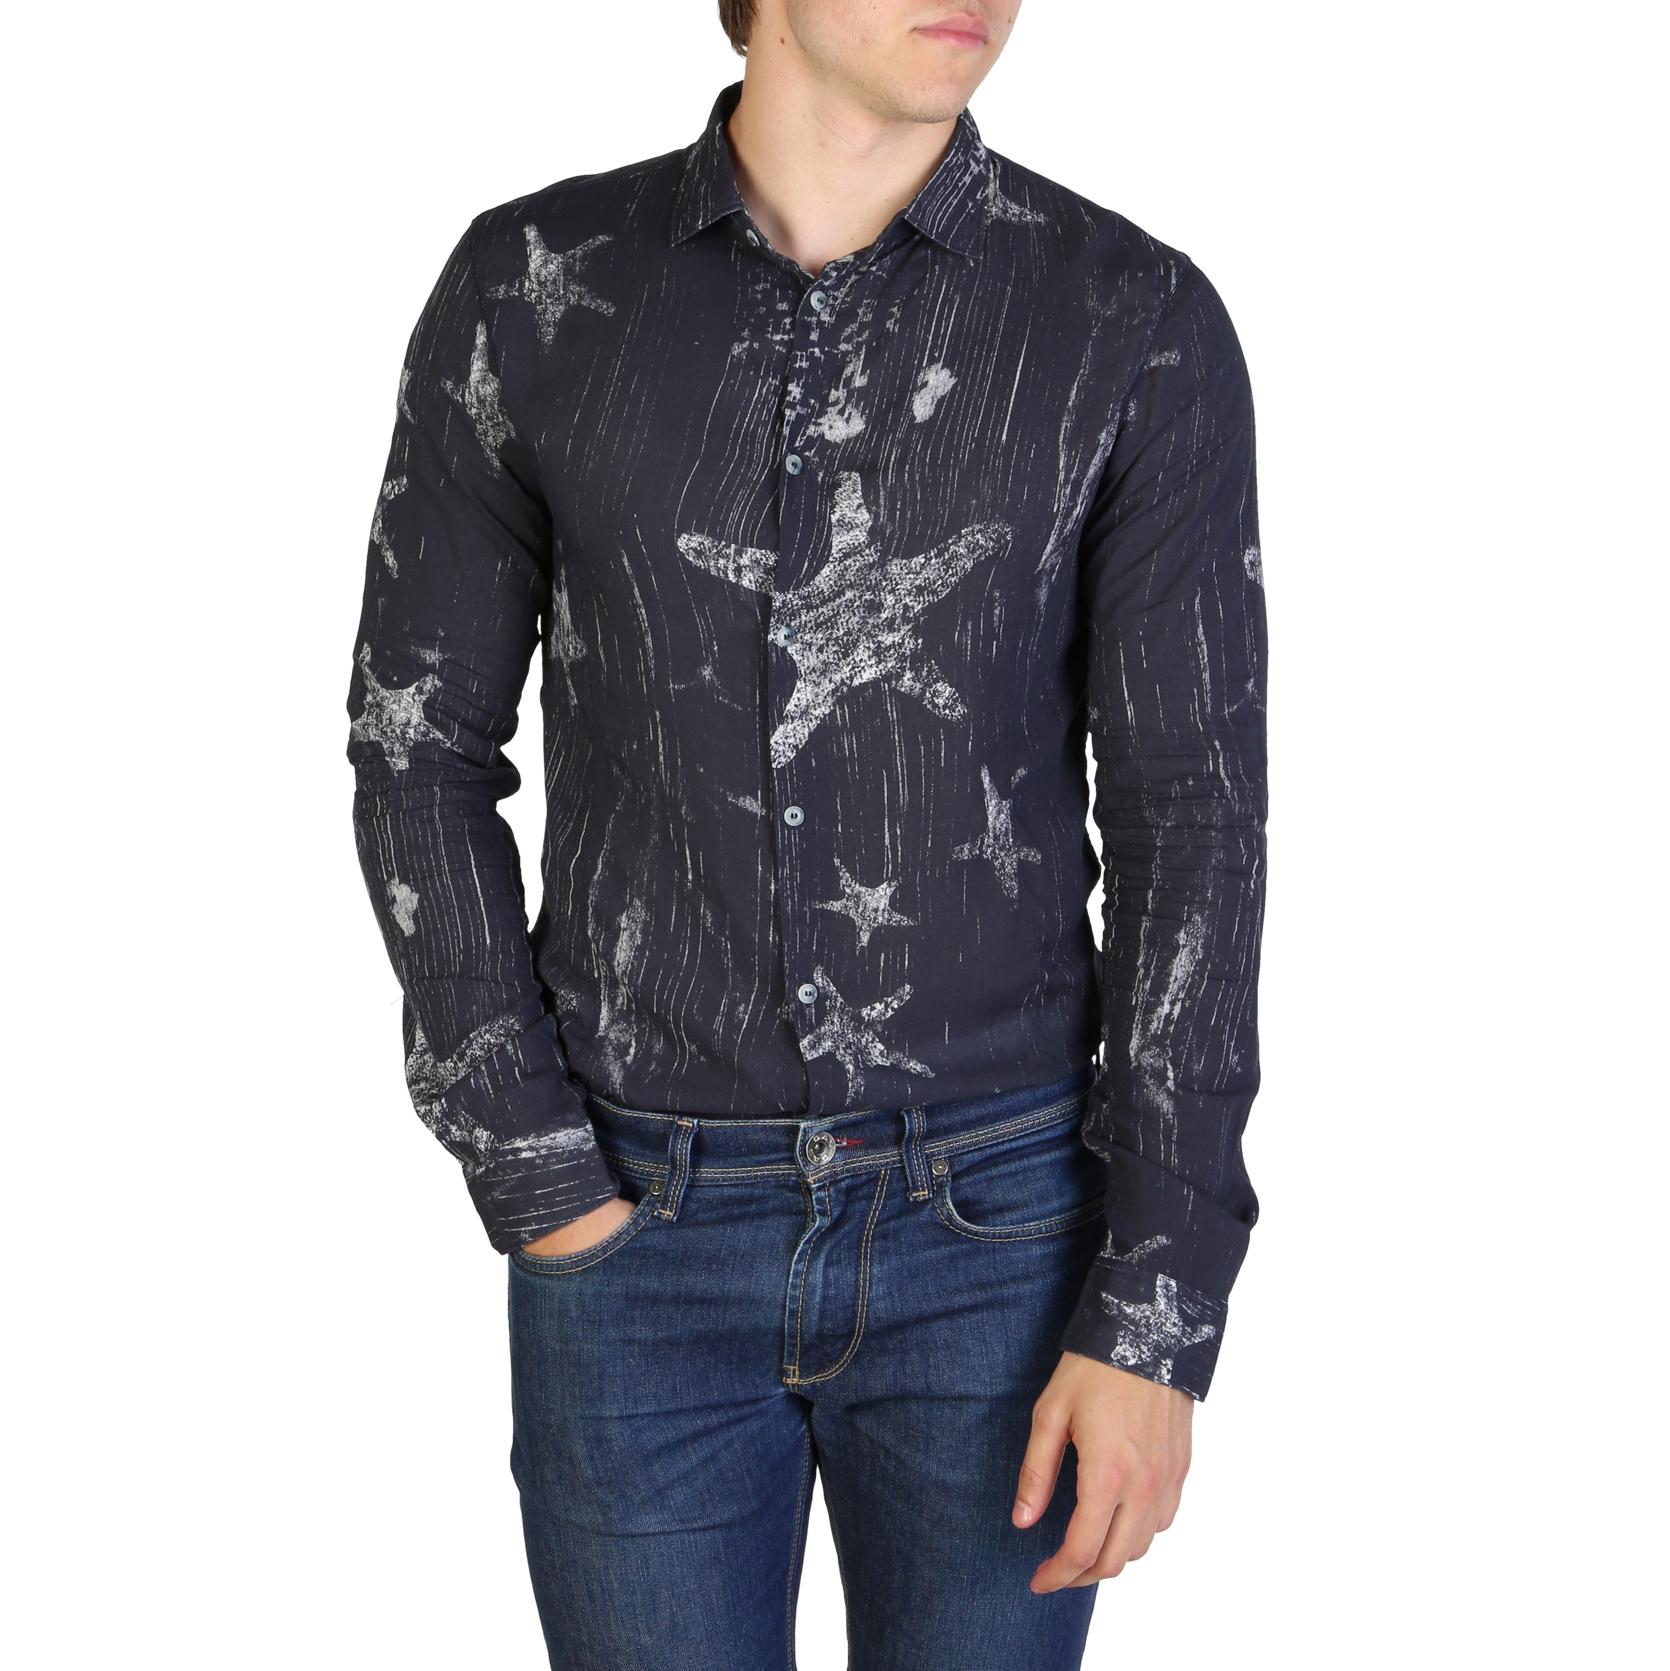 Armani Jeans C6C24_LH Uomo Blu 107848Armani Jeans